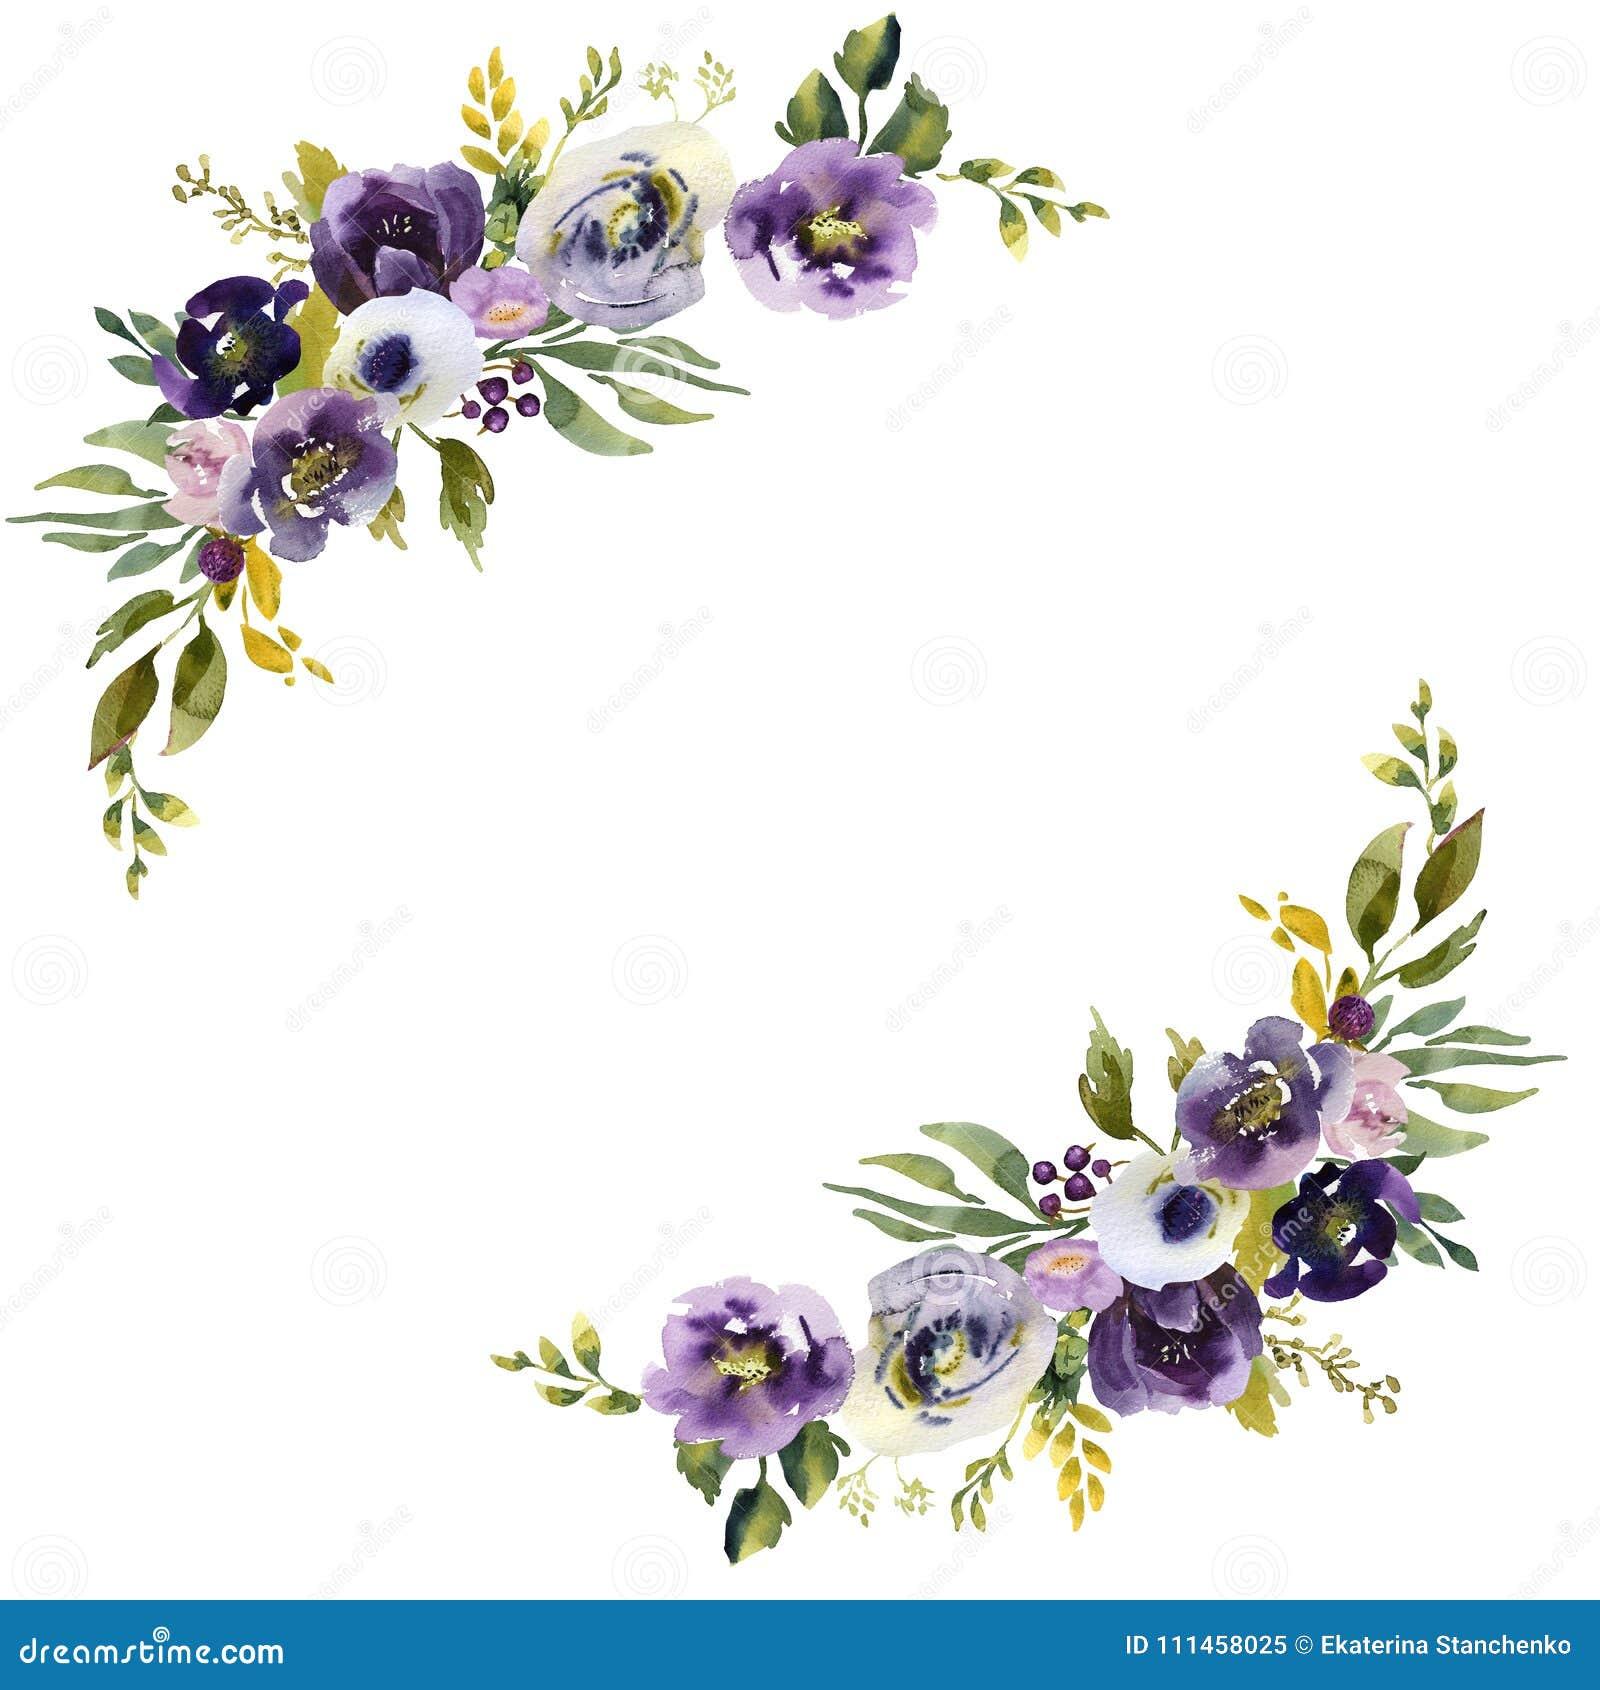 Purple Flower Wedding: Wedding Frame Wreath Green And Purple Flowers Ornament